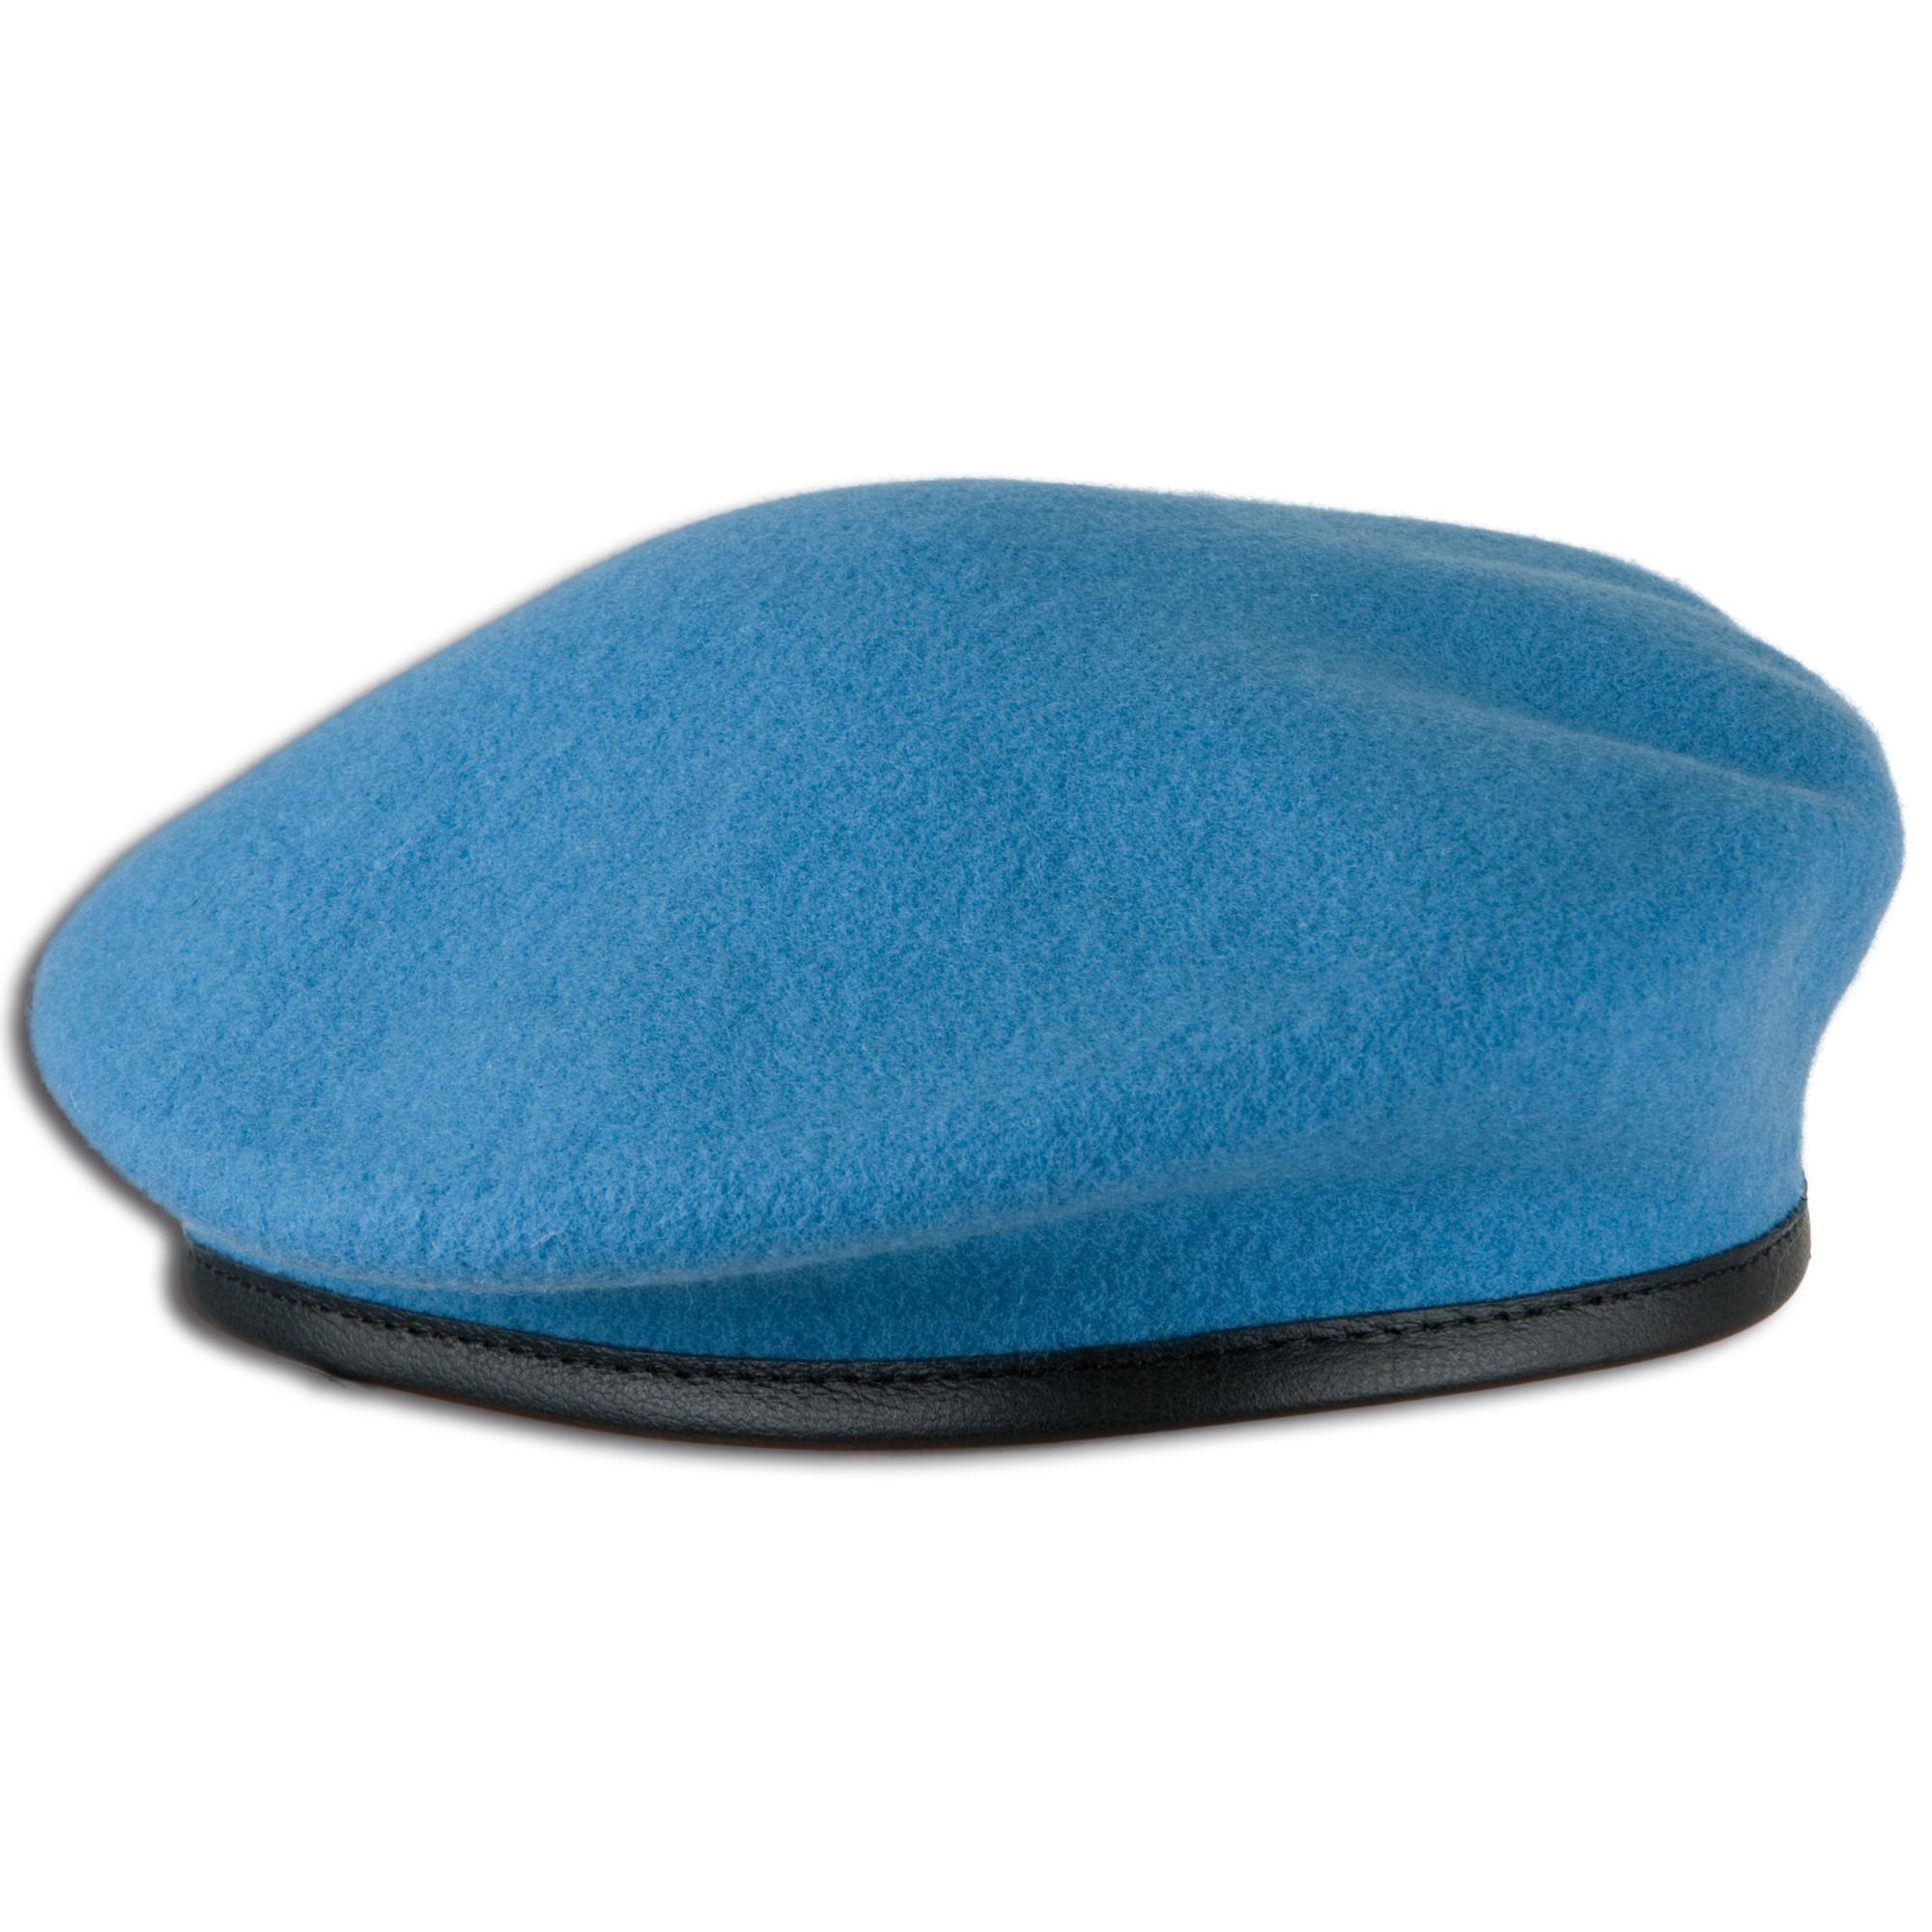 Kommando Barett UNO-blau